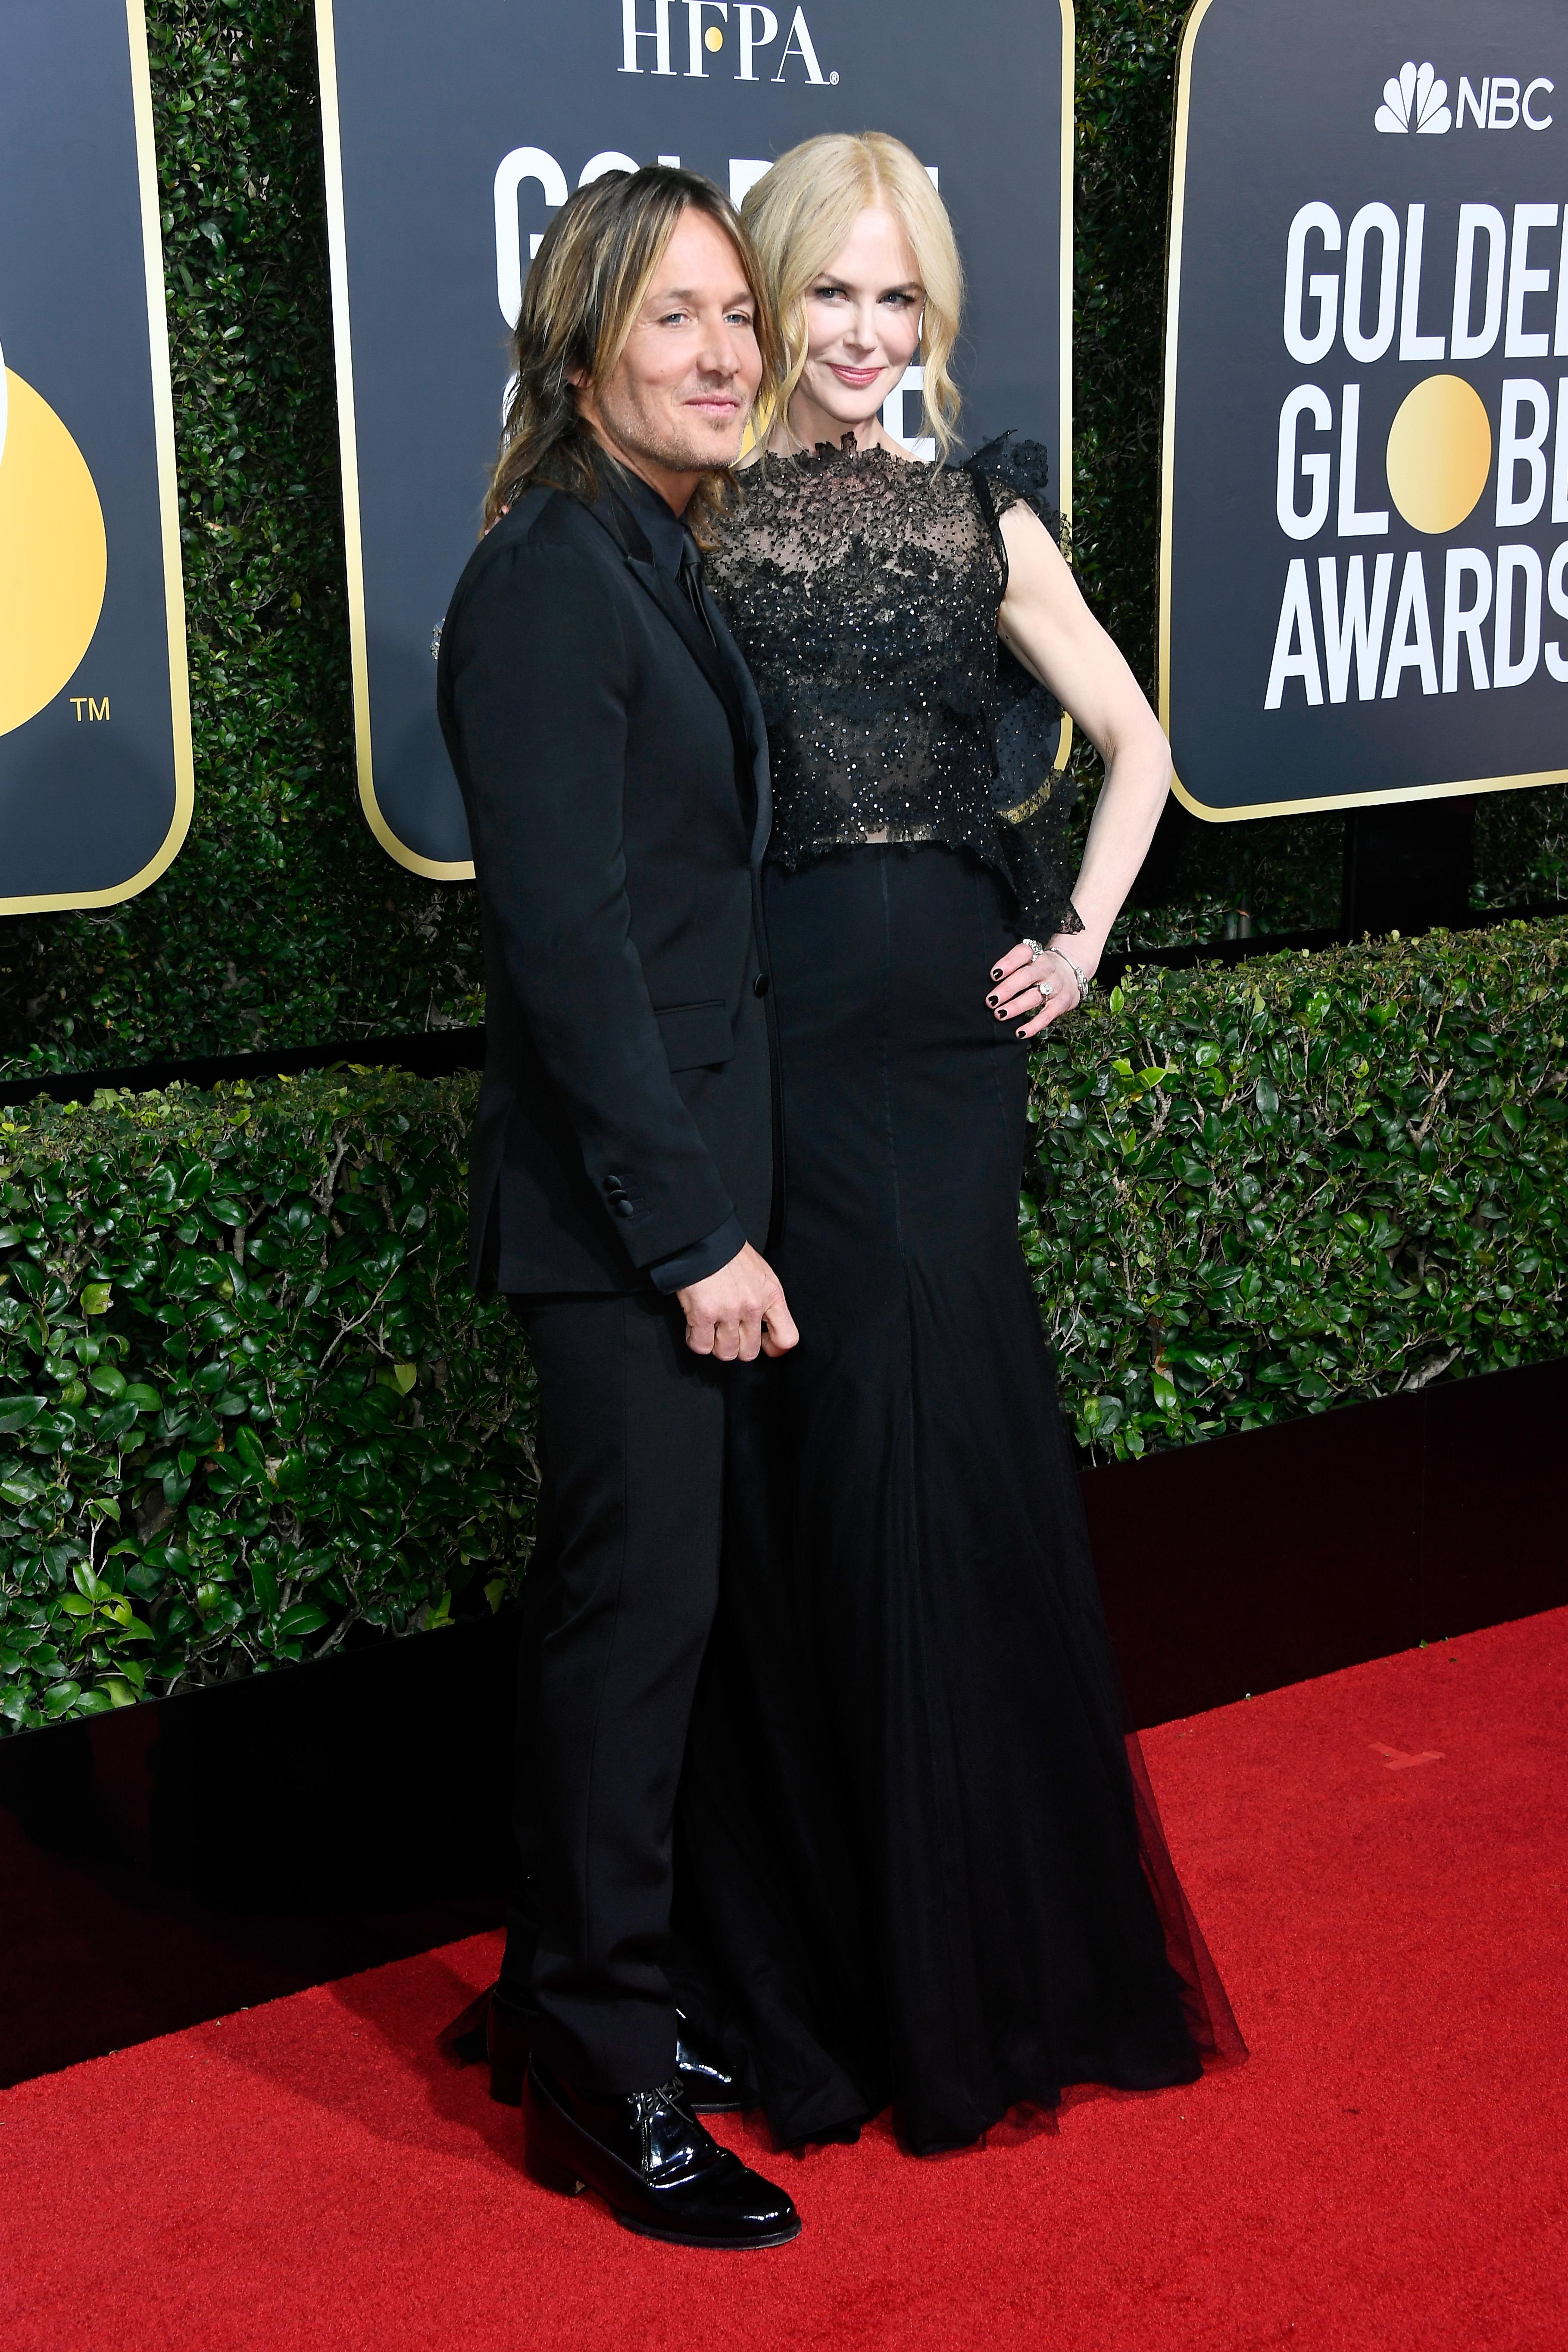 Nicole Kidman and Keith Urban Golden Globes 2018